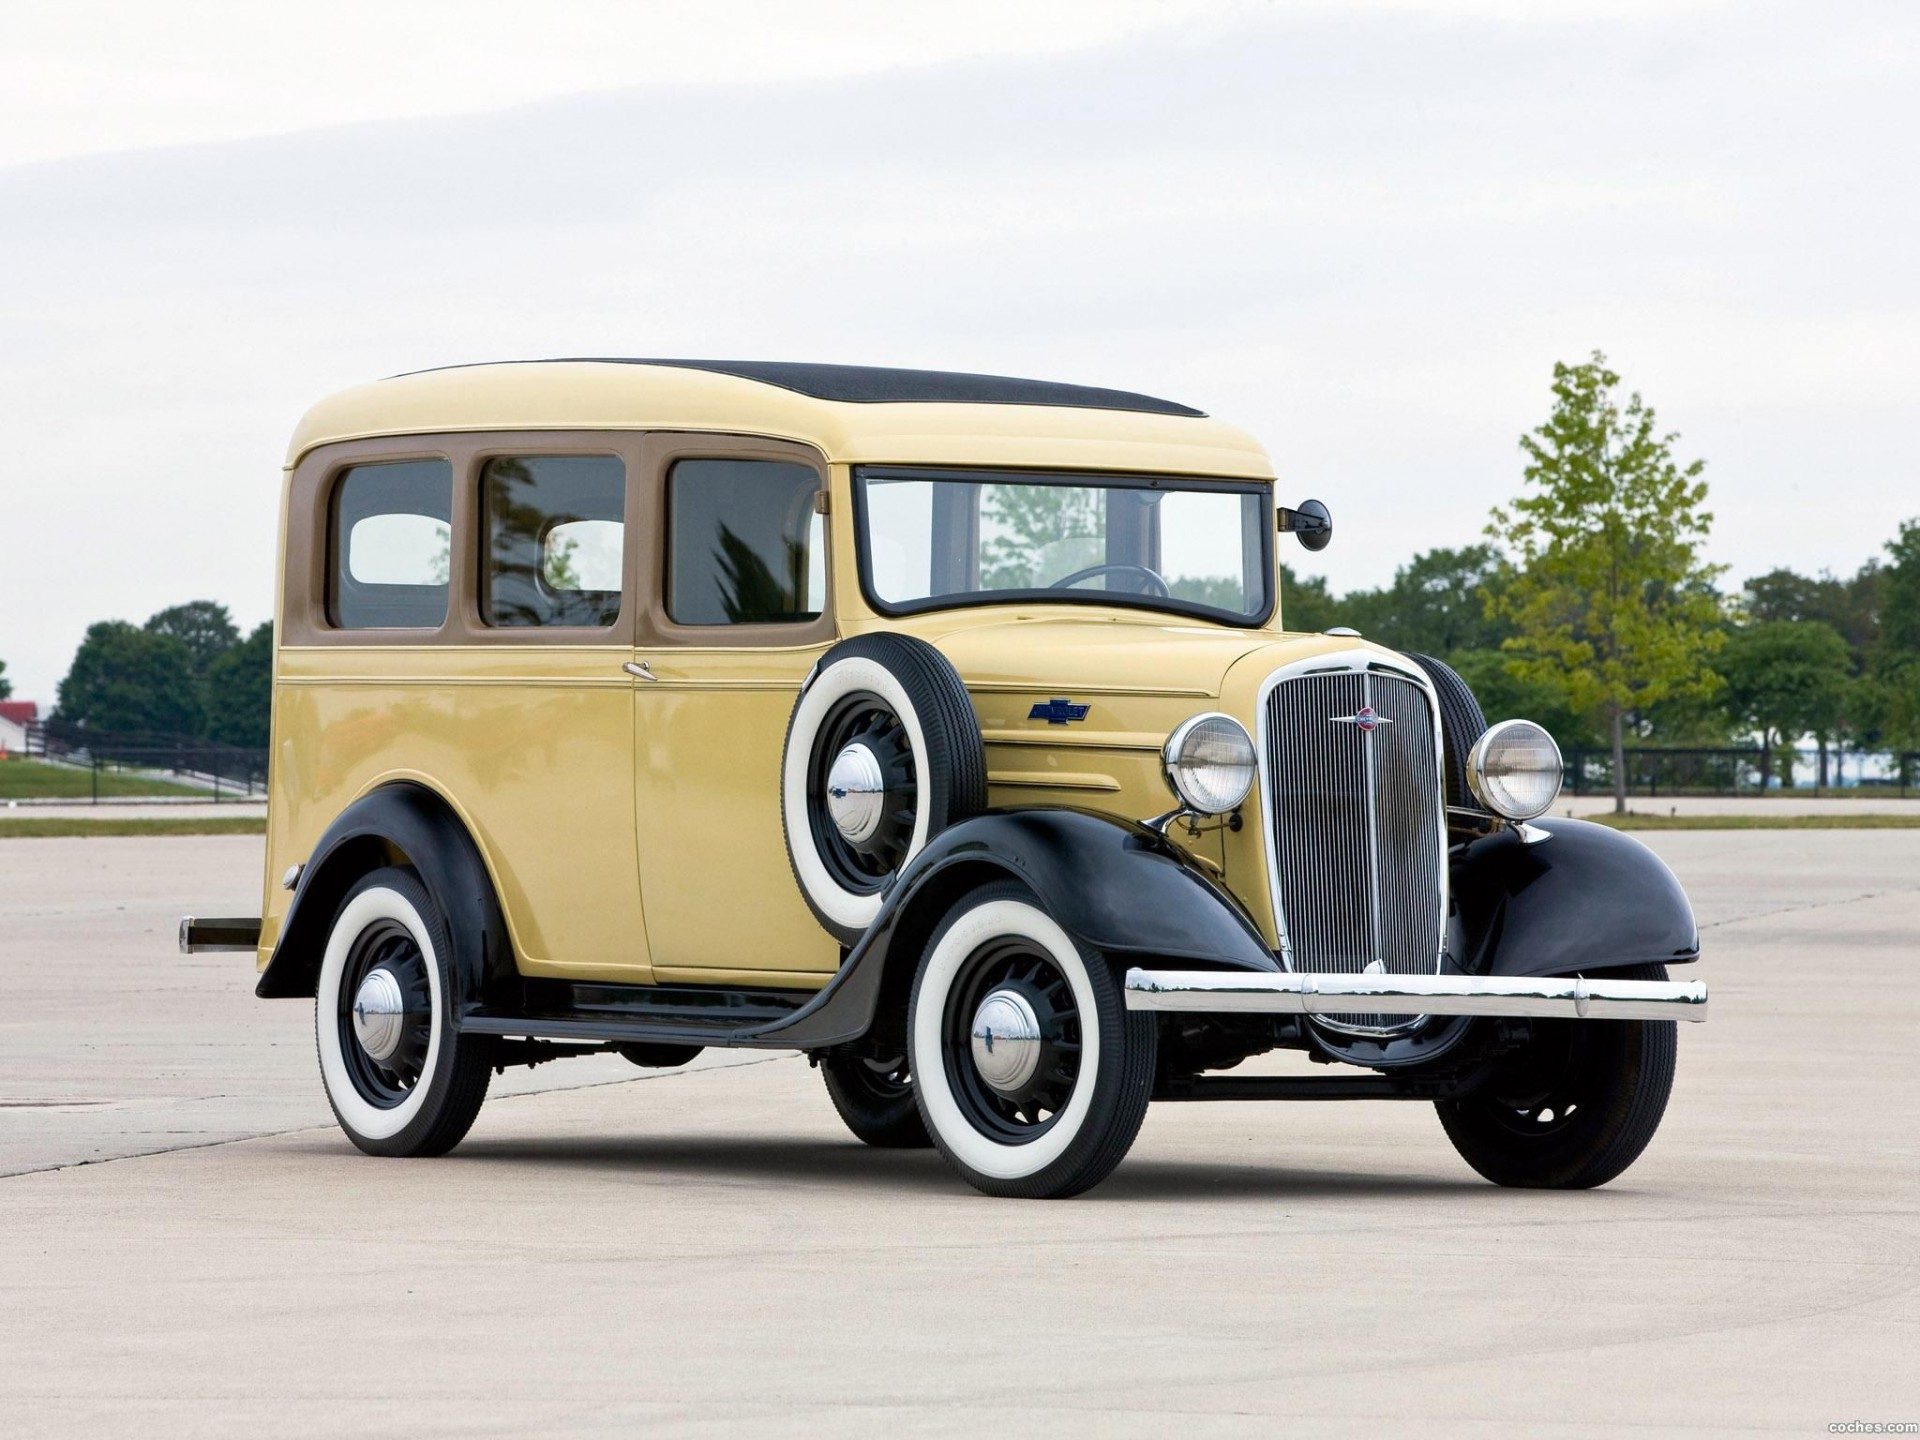 1935 Chevrolet Carryall Suburban